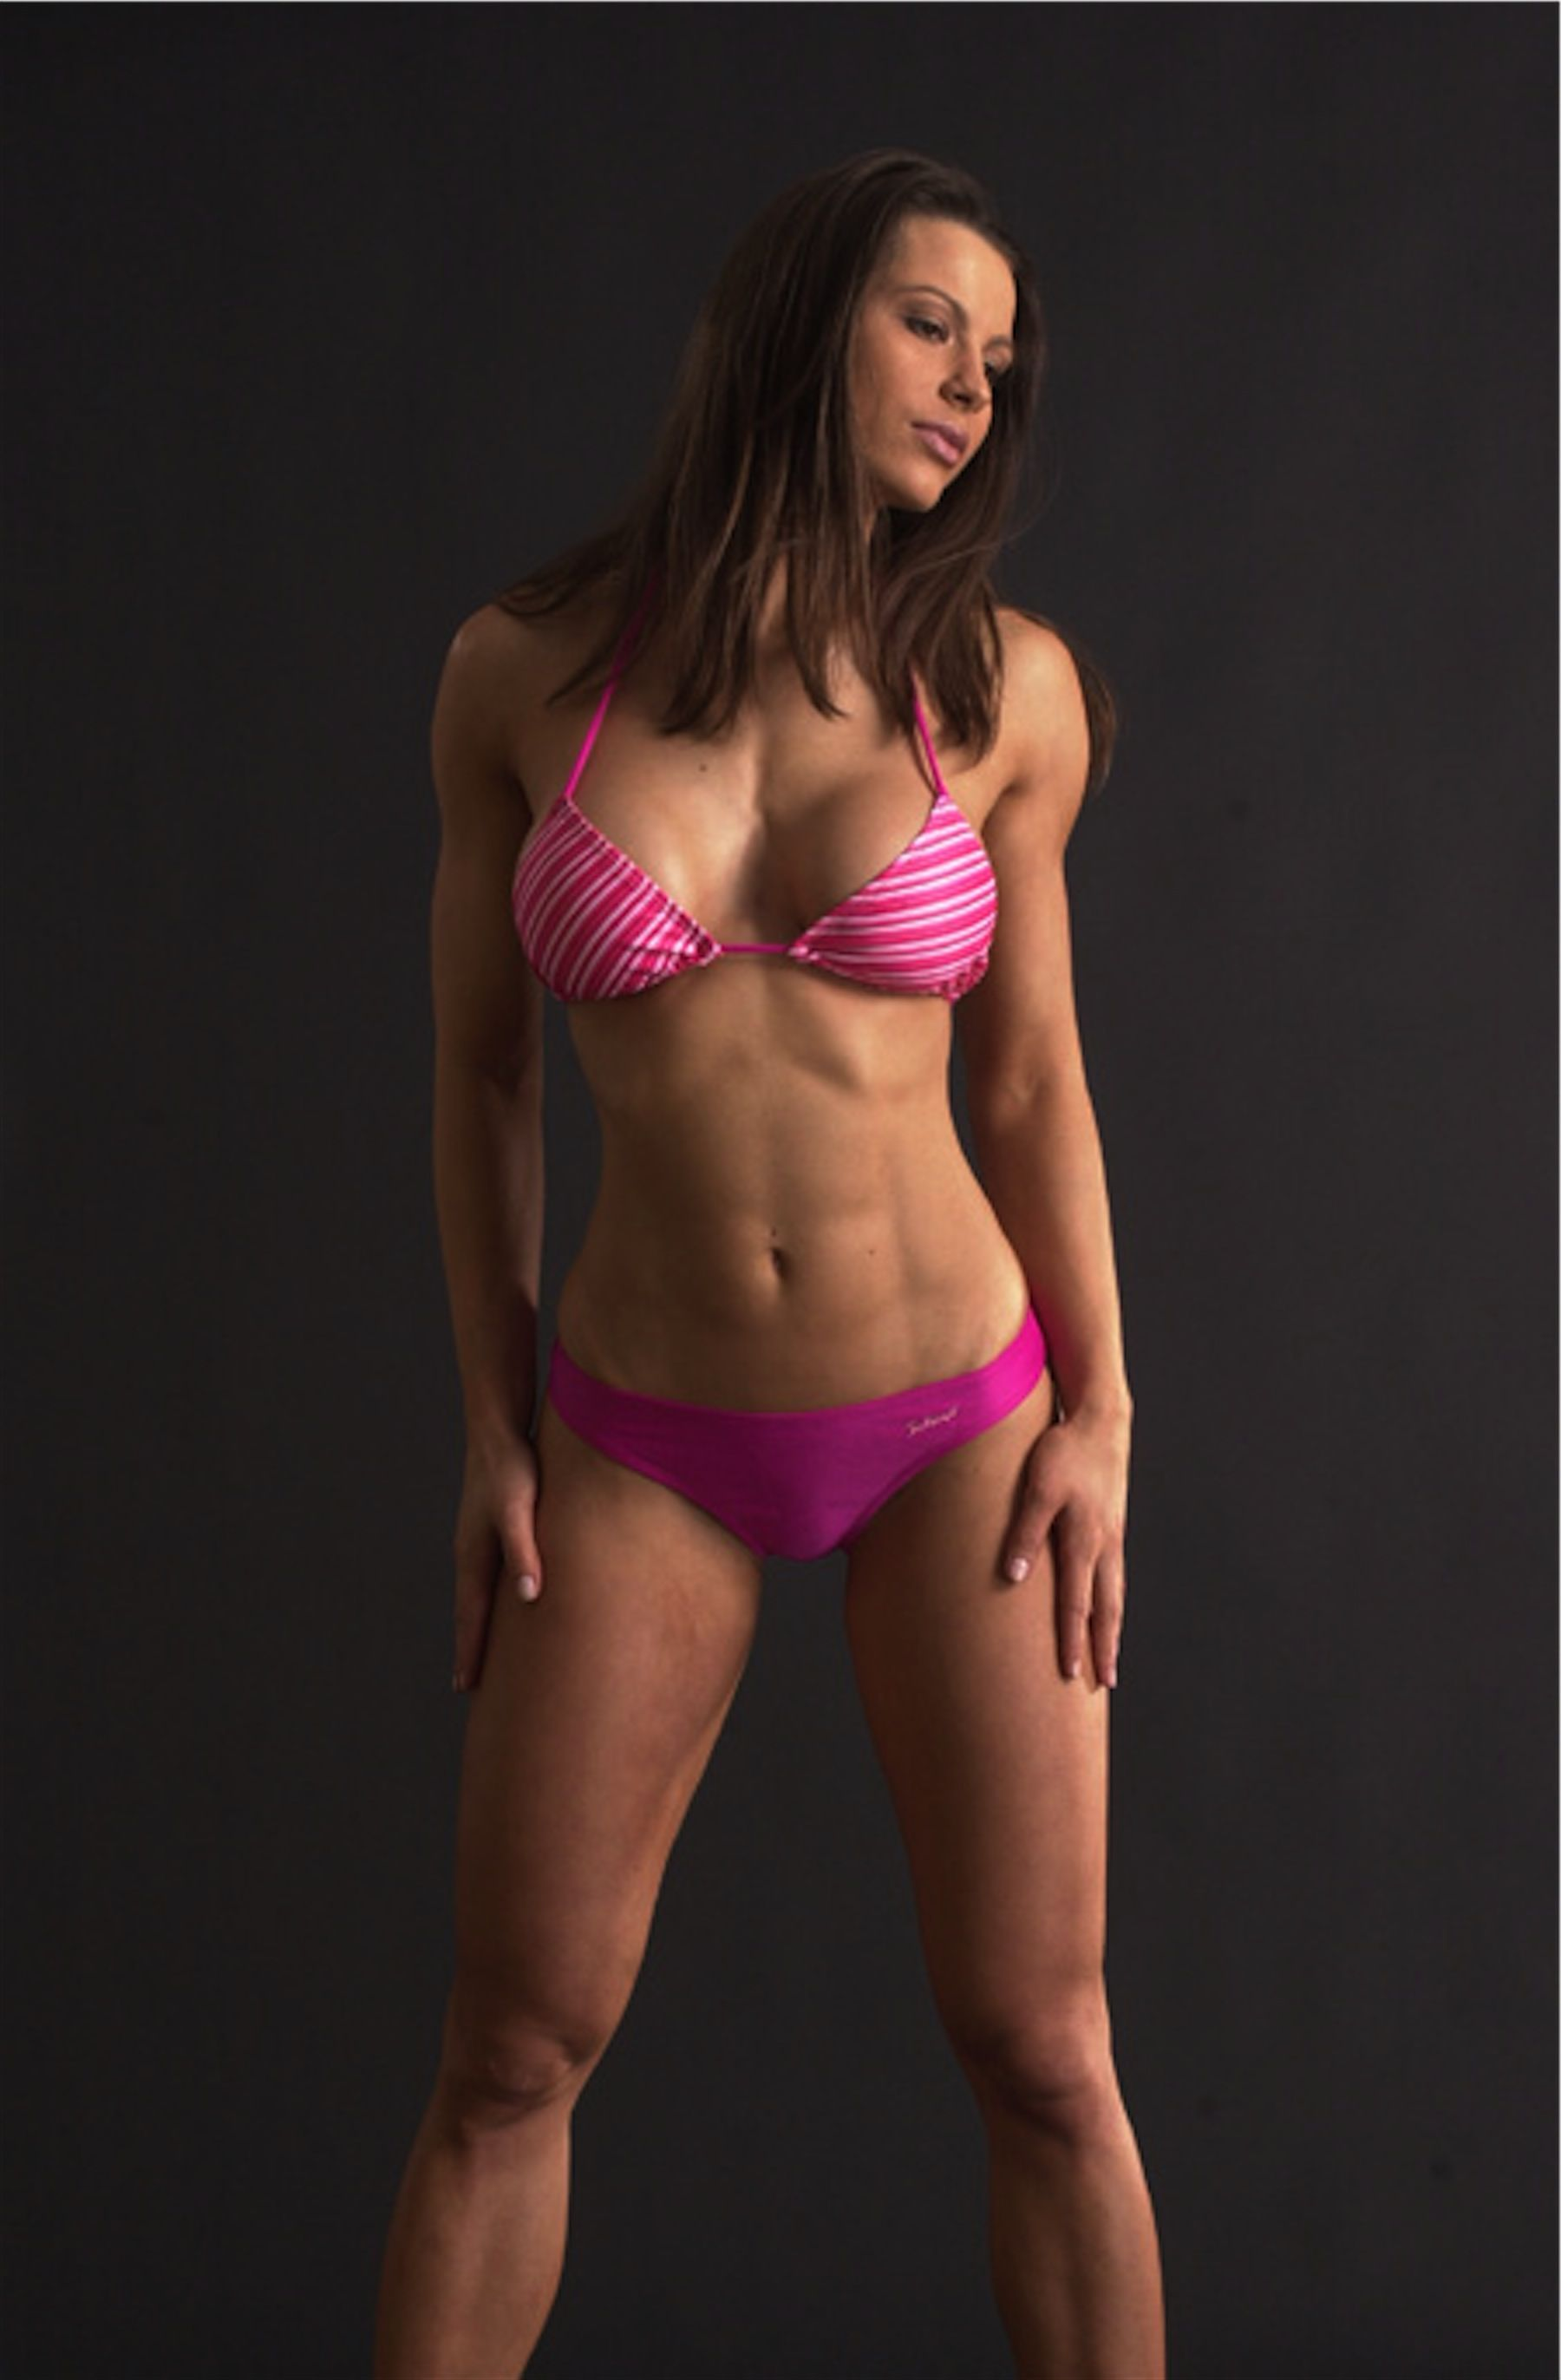 Jilena Cori Nude Photos 53